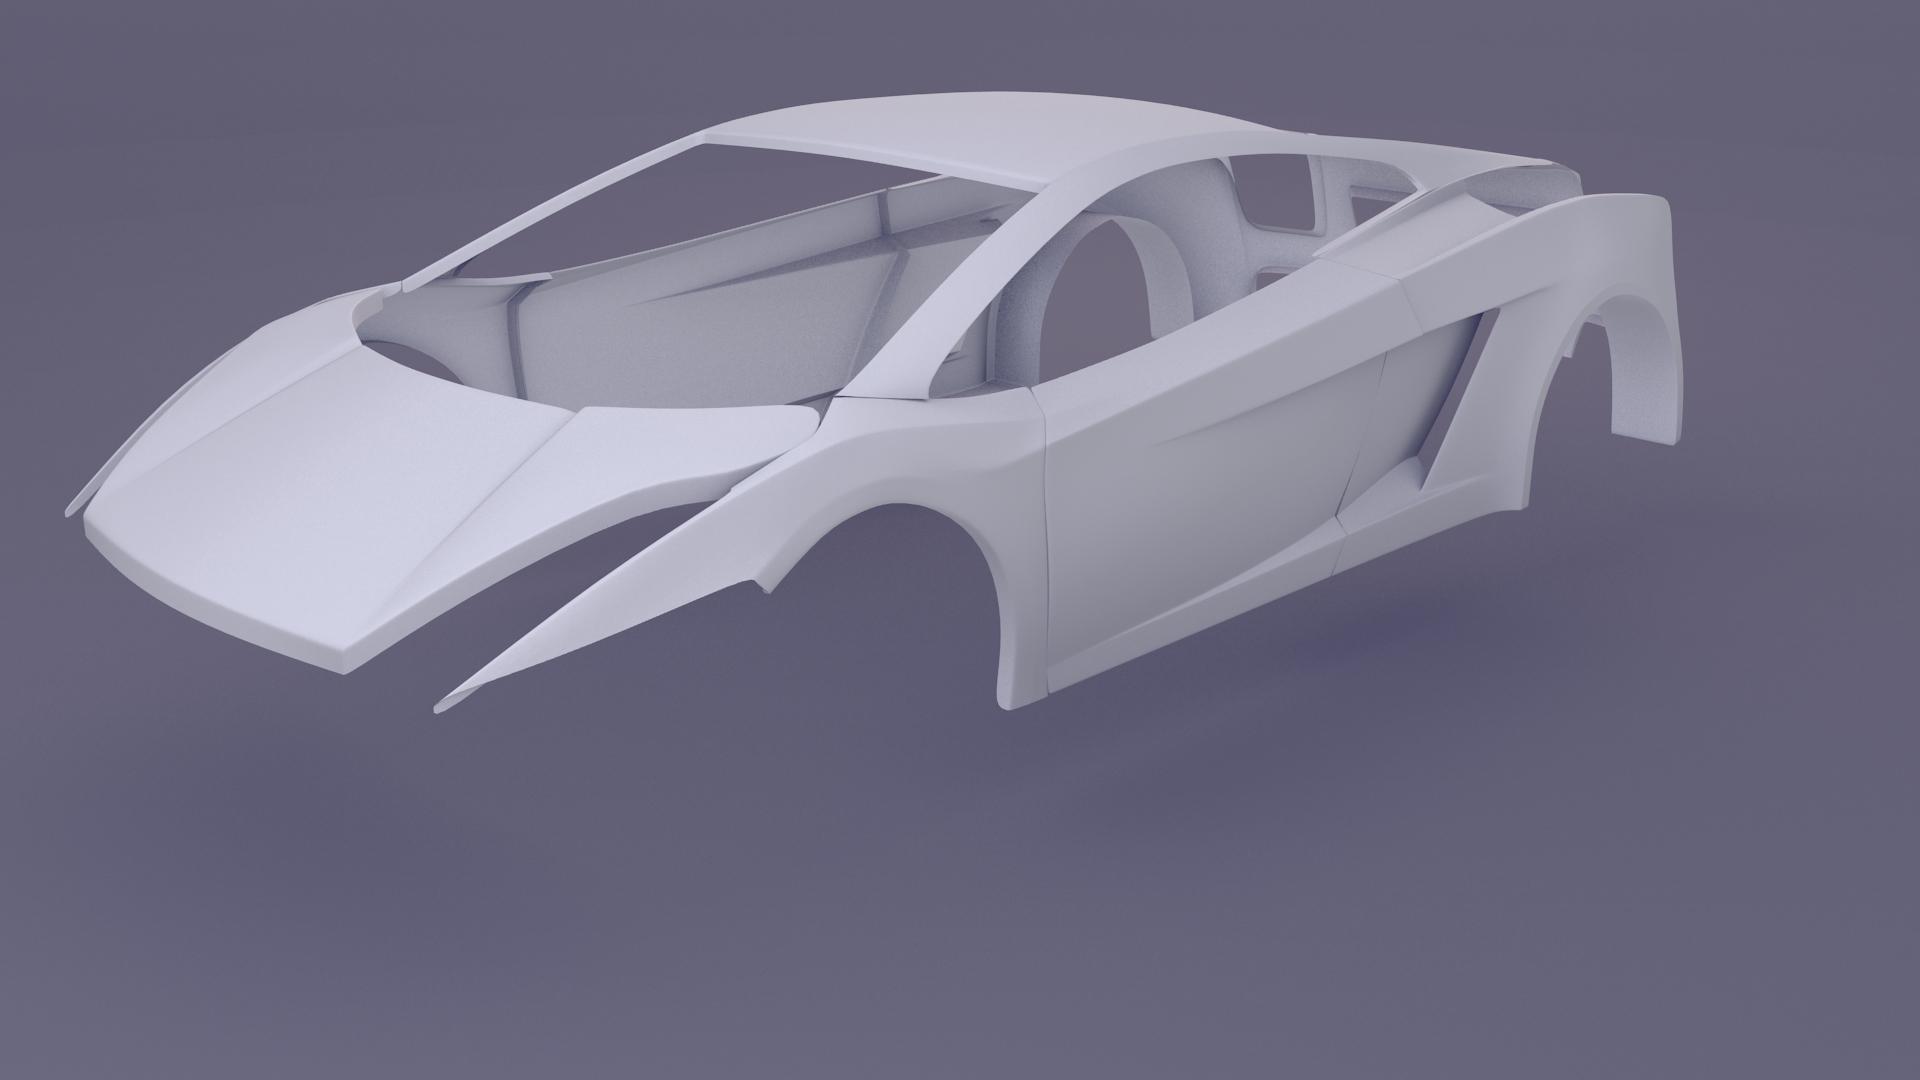 Lamborghini Gallardo Superleggera - Works in Progress ... on